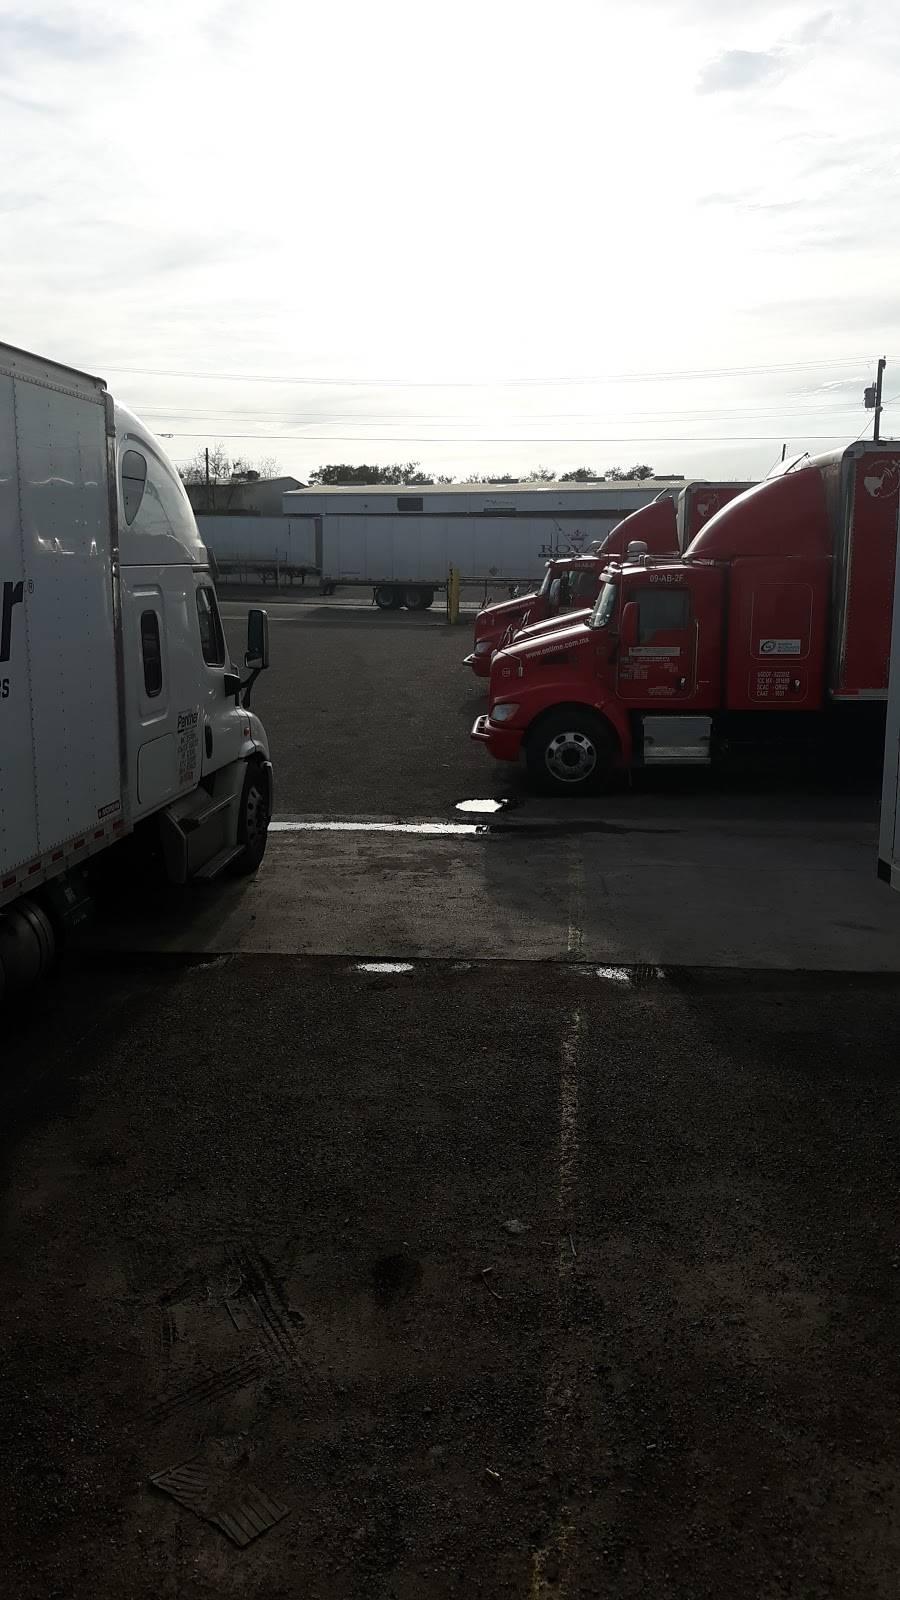 On Time International - moving company  | Photo 2 of 2 | Address: 14409 Investment Ave, Laredo, TX 78045, USA | Phone: (956) 413-8100